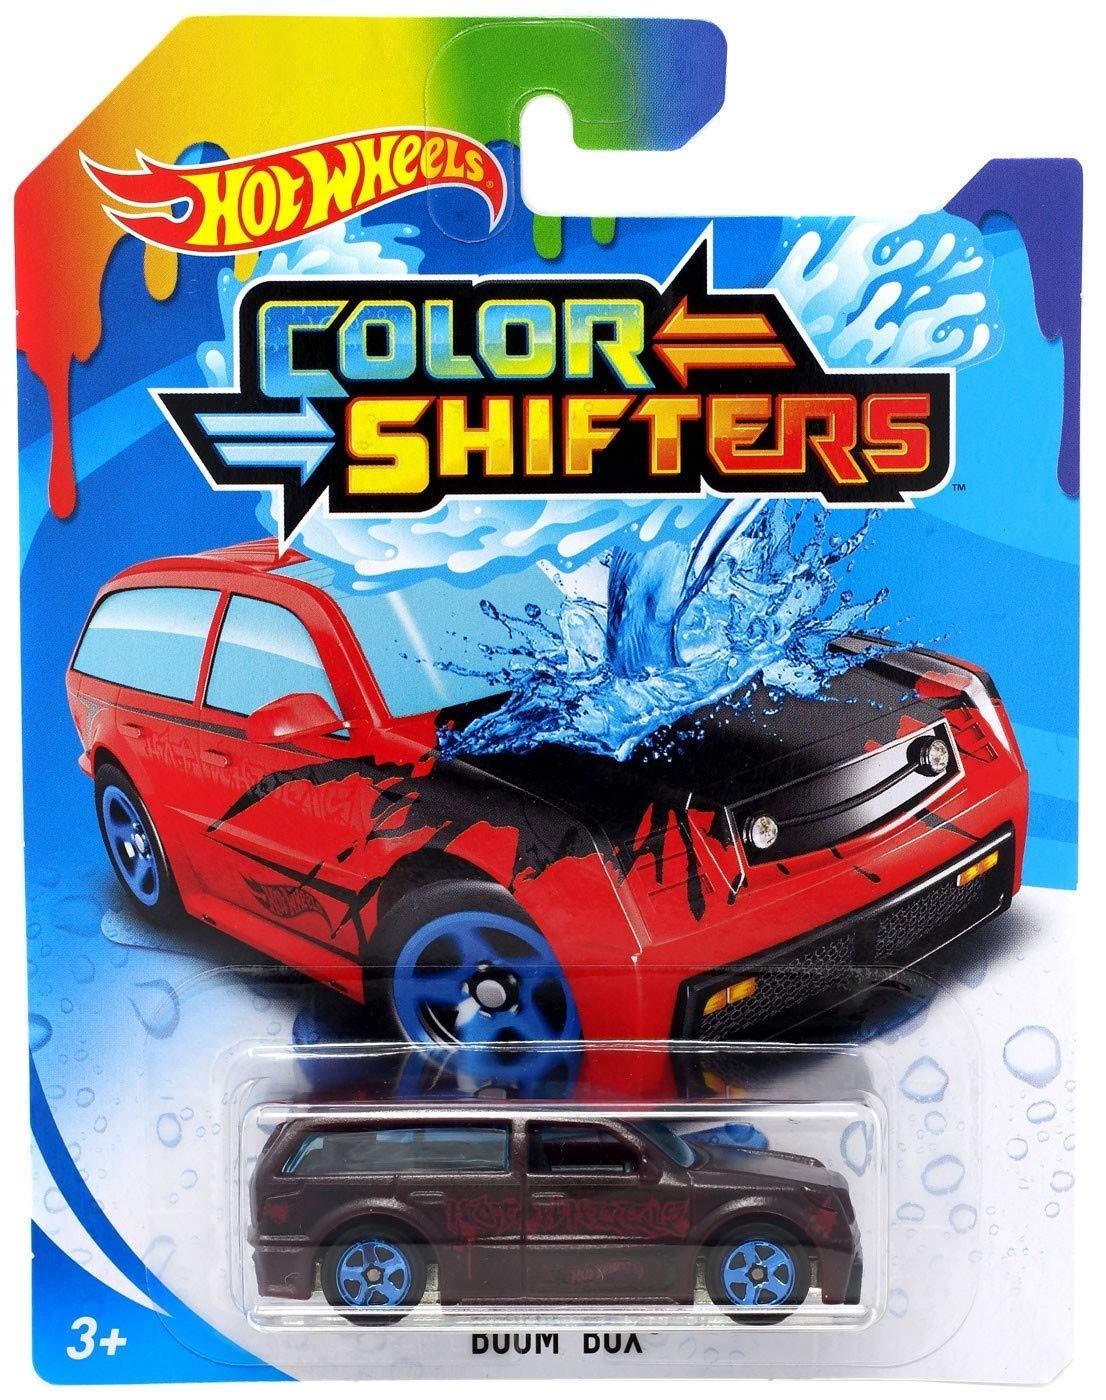 Hot Wheels Colour Shifters - Boom Box